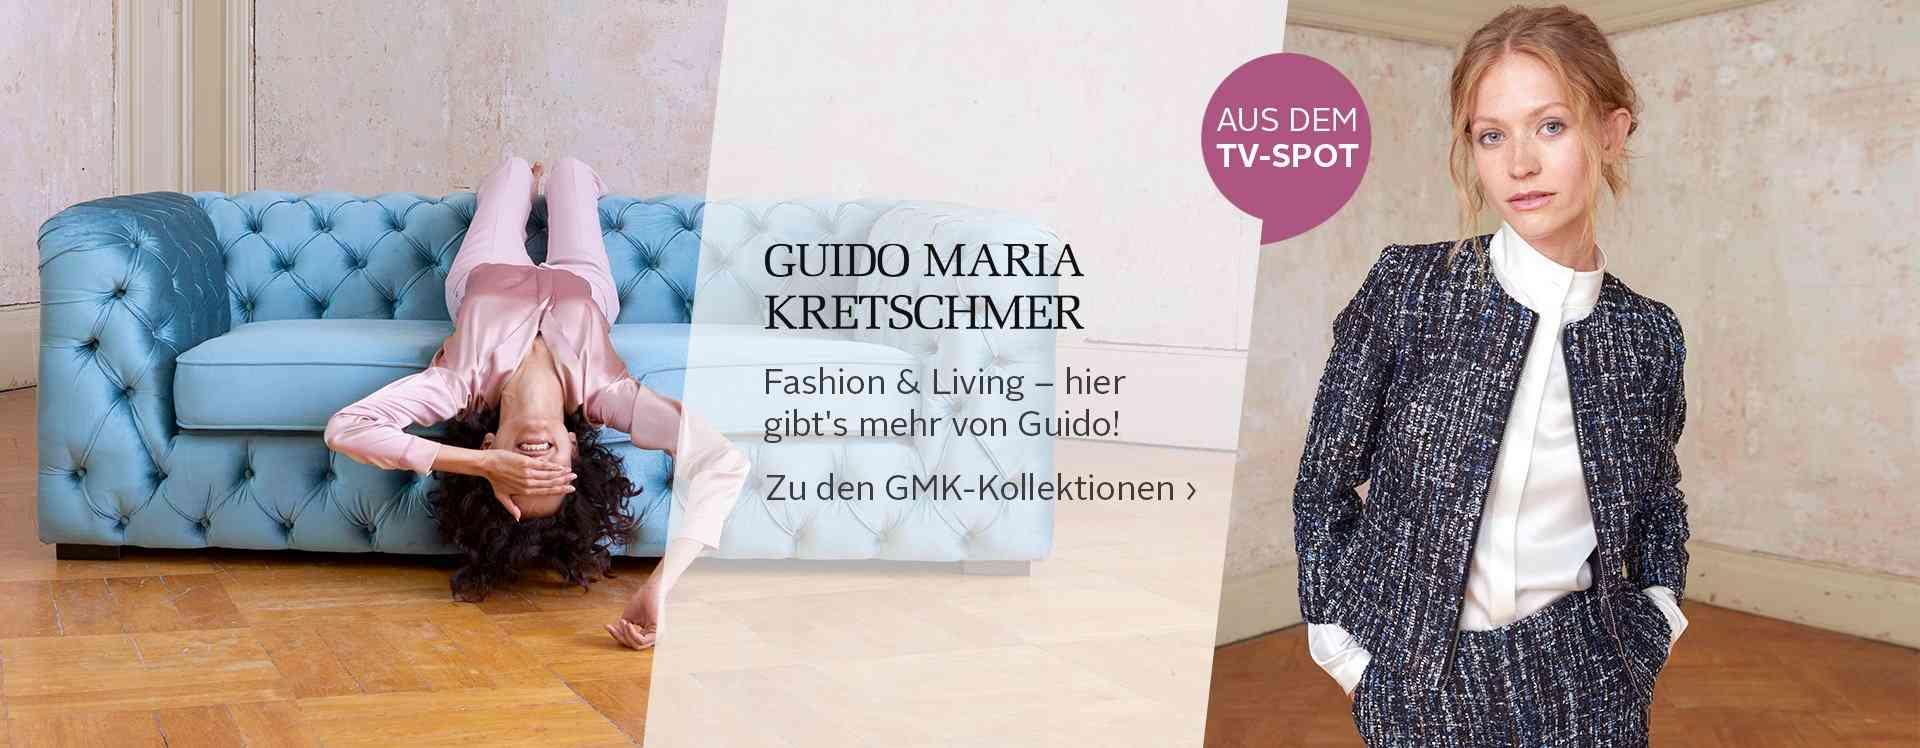 damenmode online kaufen mode shop f r damen otto. Black Bedroom Furniture Sets. Home Design Ideas